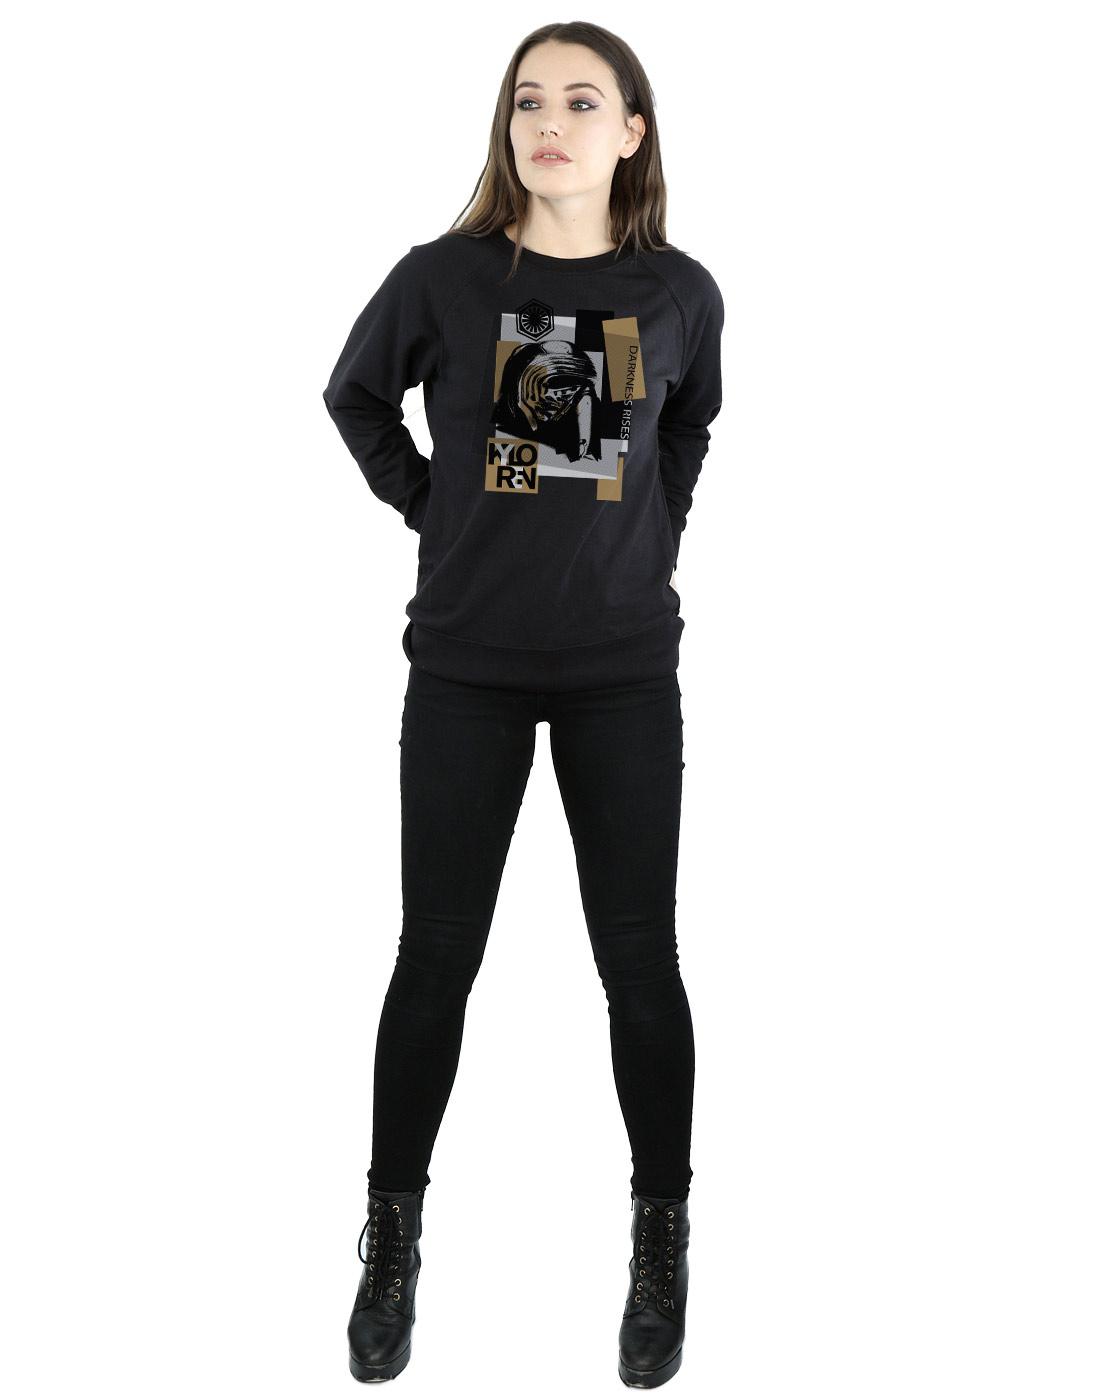 Star-Wars-mujer-The-Last-Jedi-Kylo-Ren-Patchwork-Camisa-De-Entrenamiento